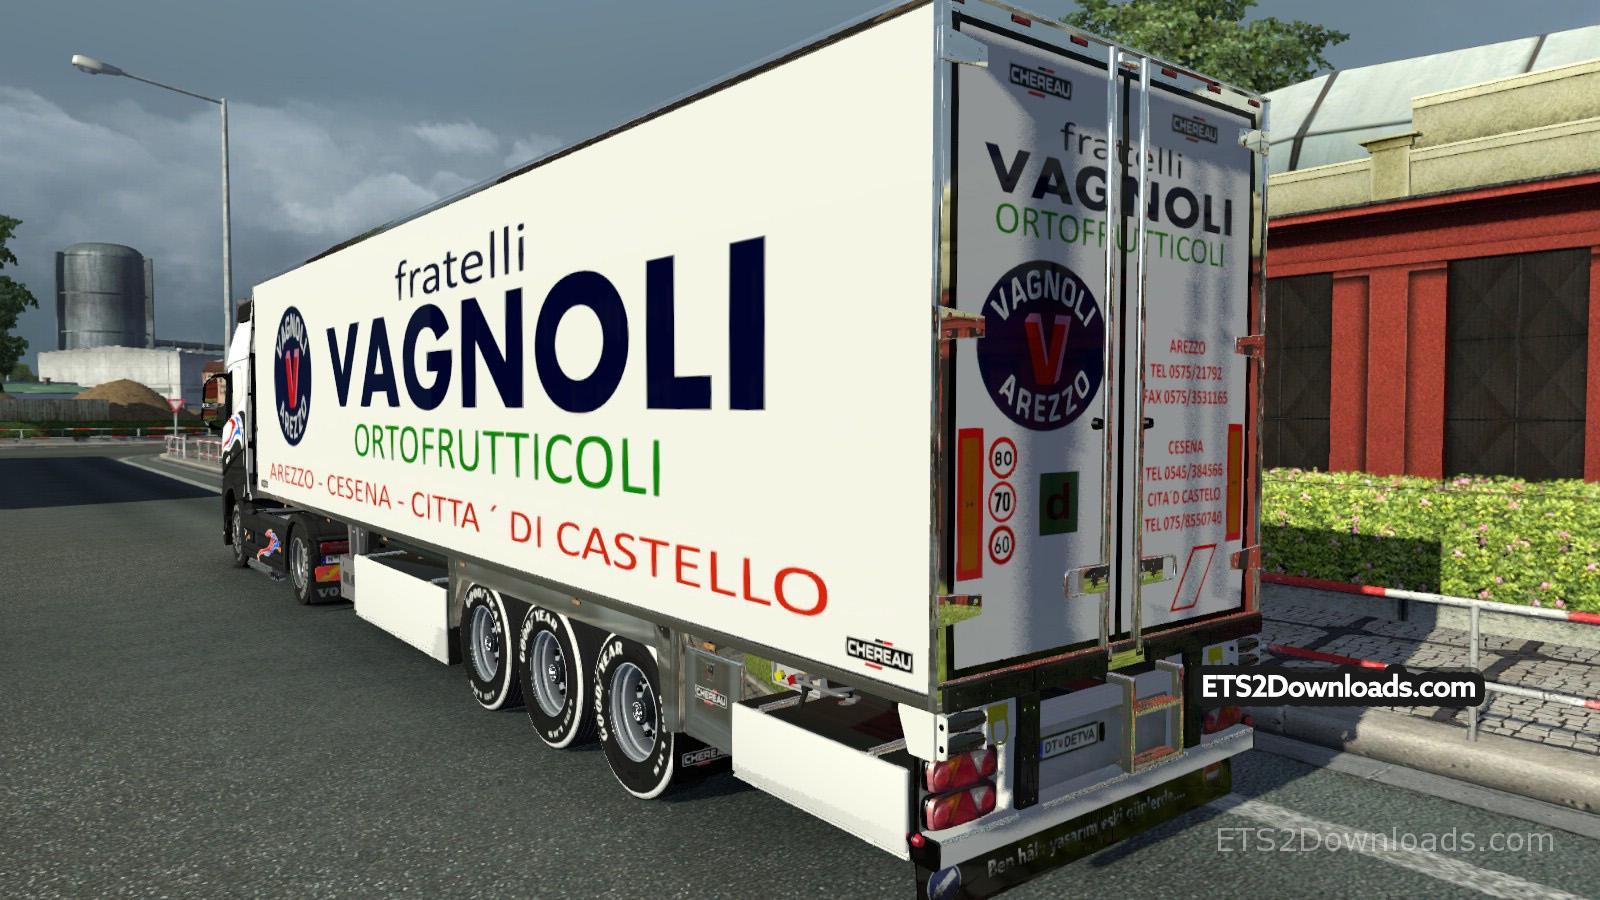 chereau-vagnoli-trailer